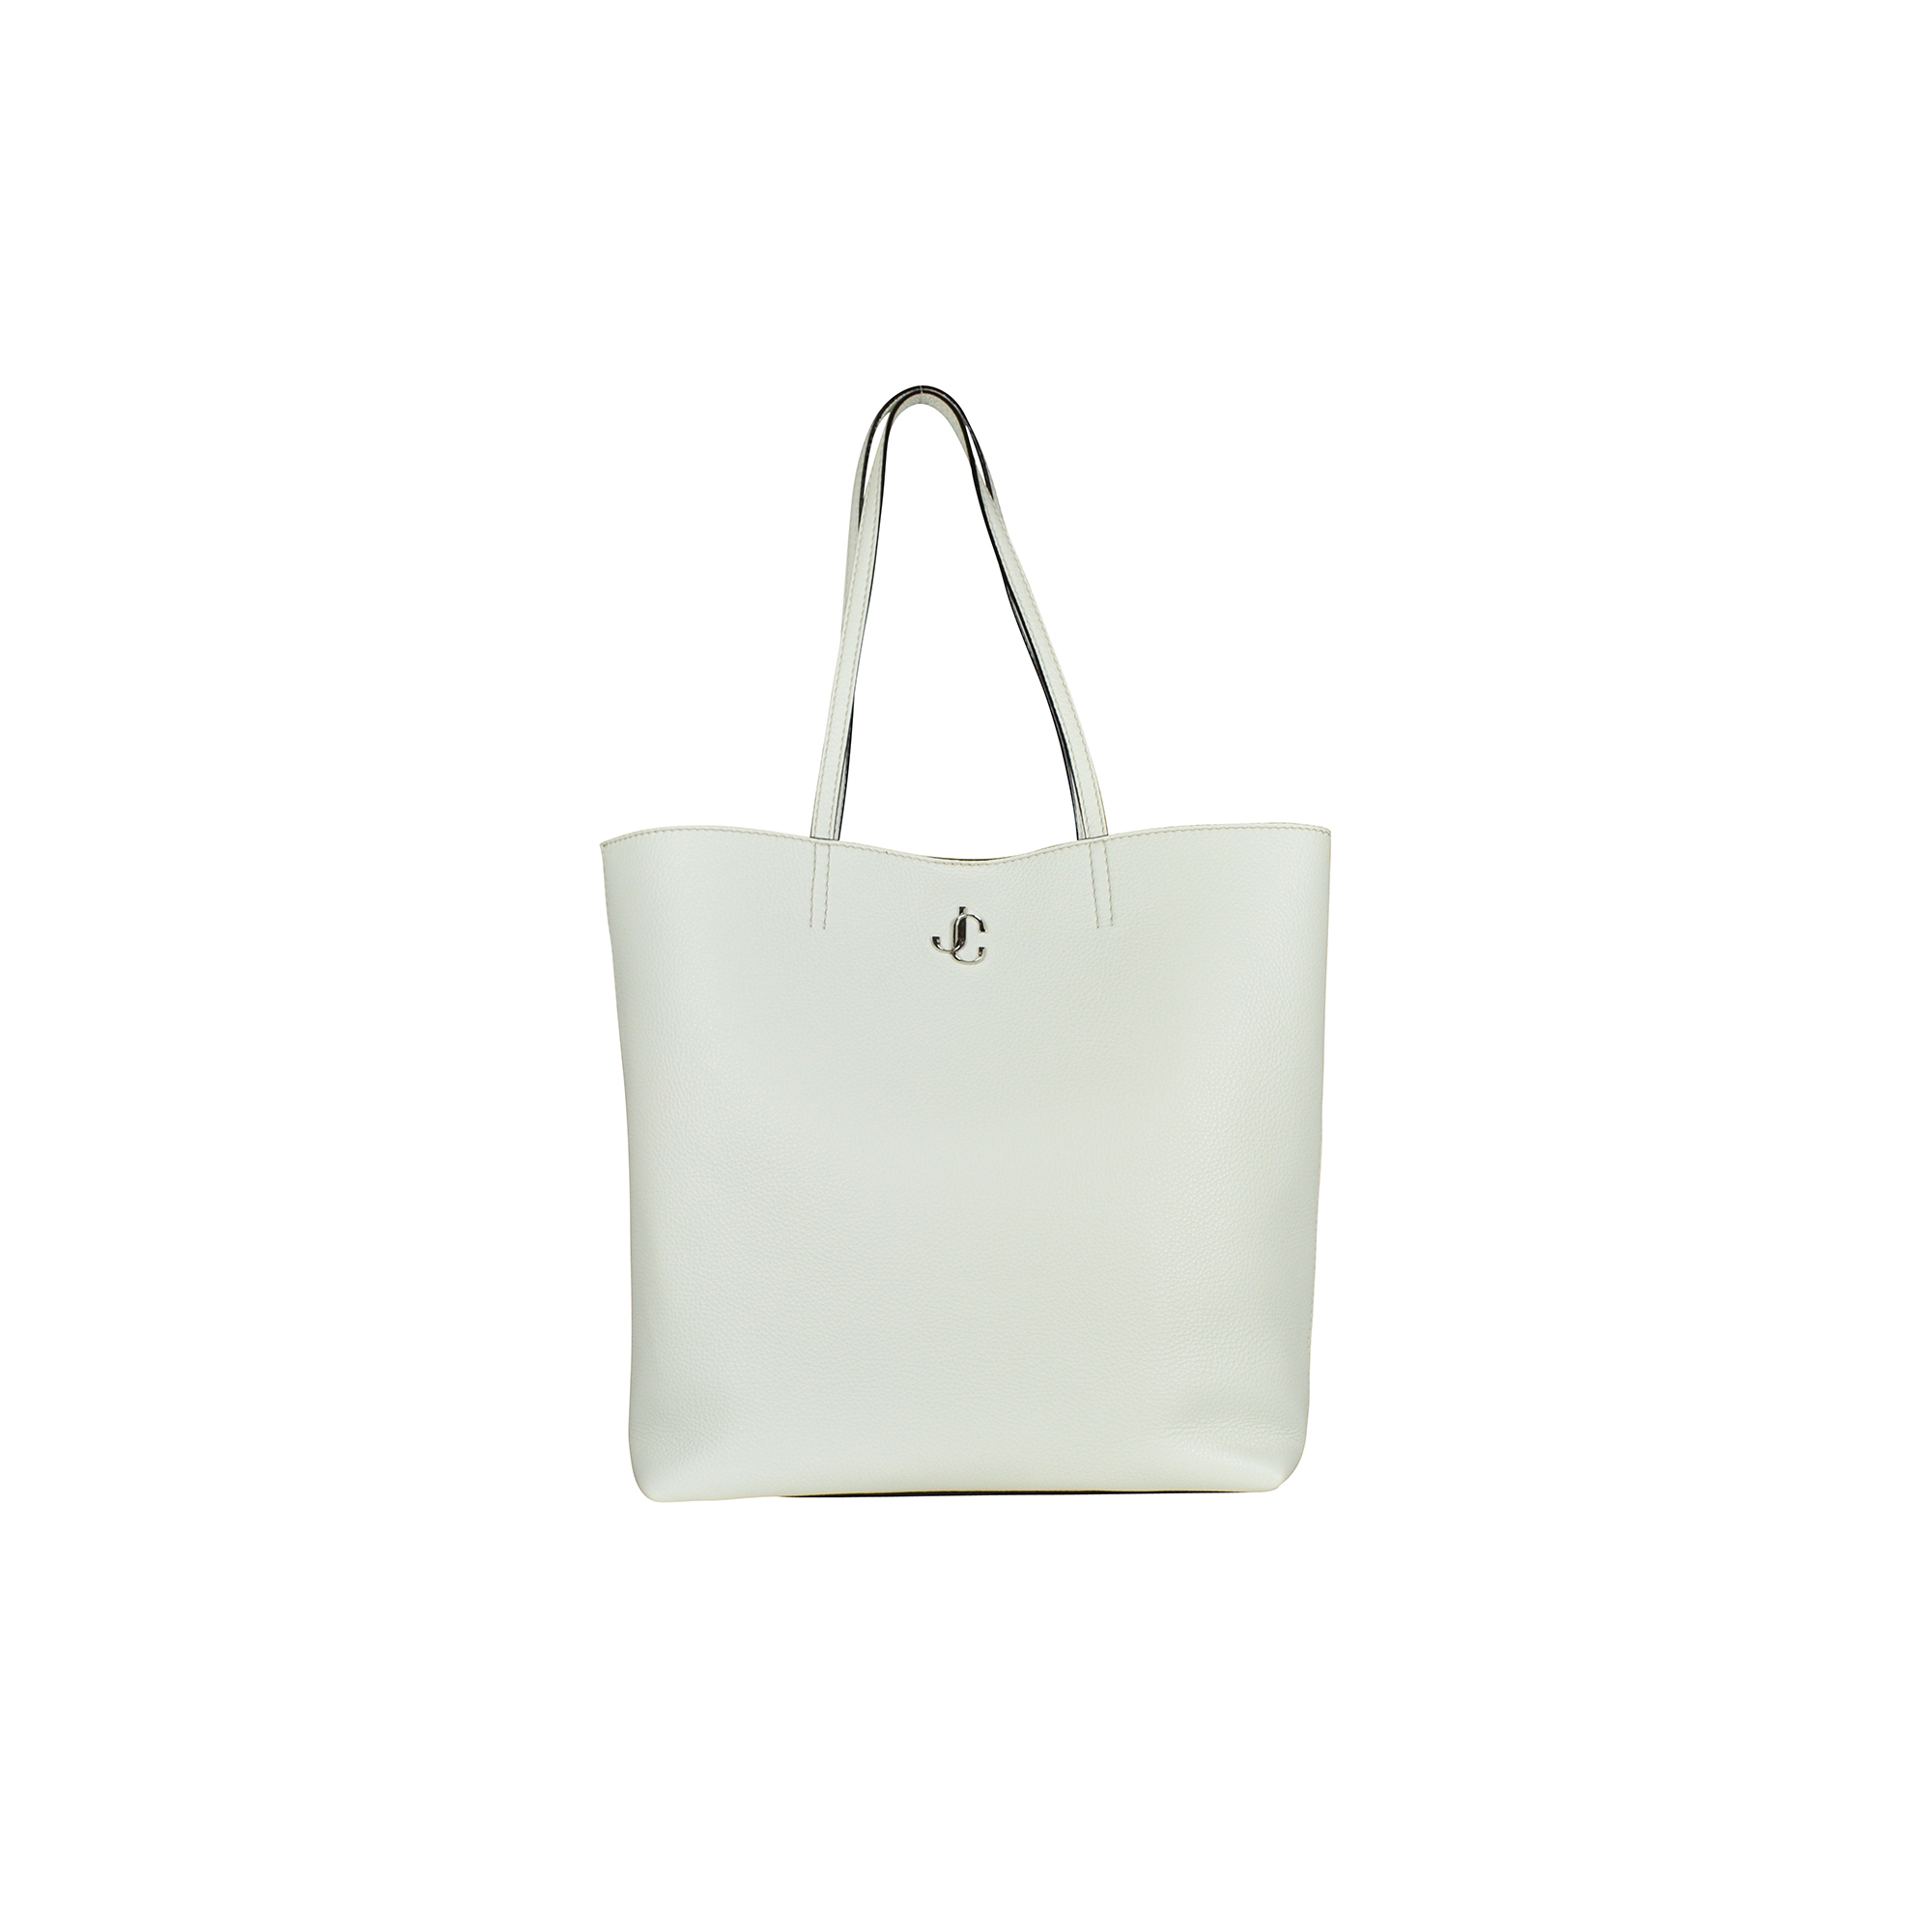 Jimmy Choo white grained leather handbag.